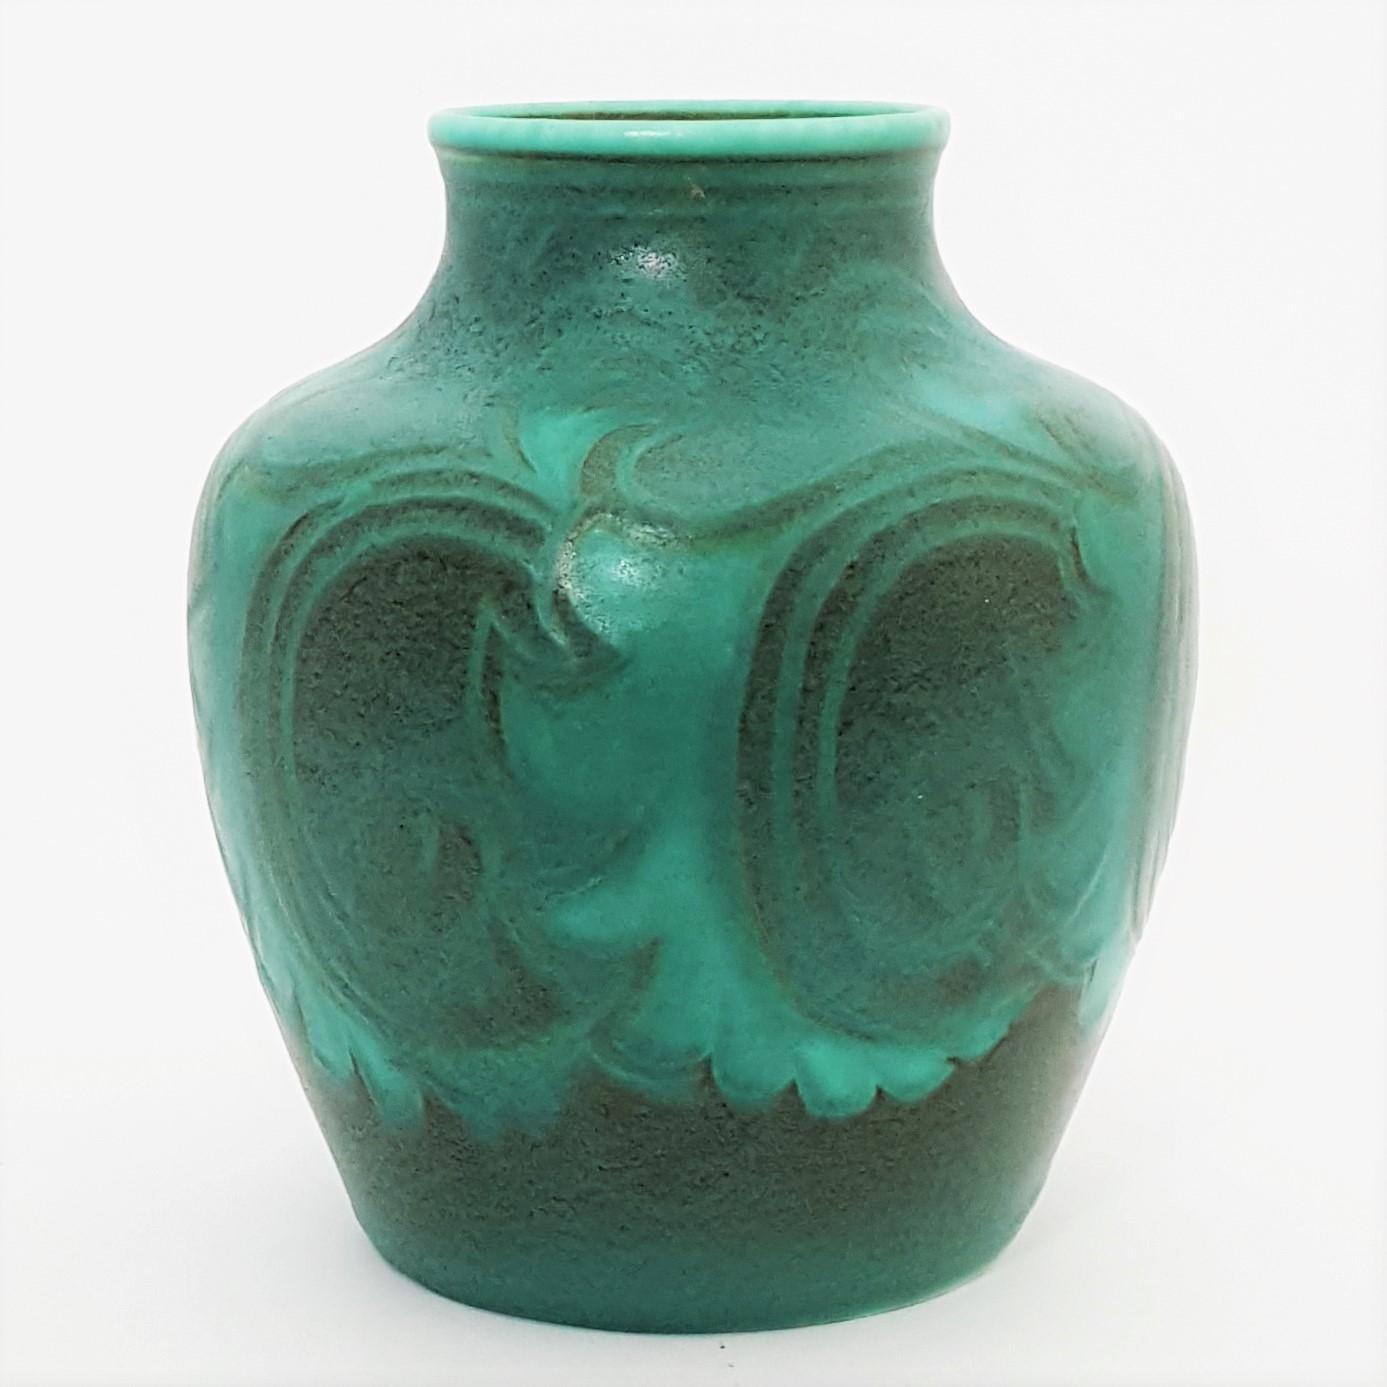 Pilkington Royal Lancastrian Vase